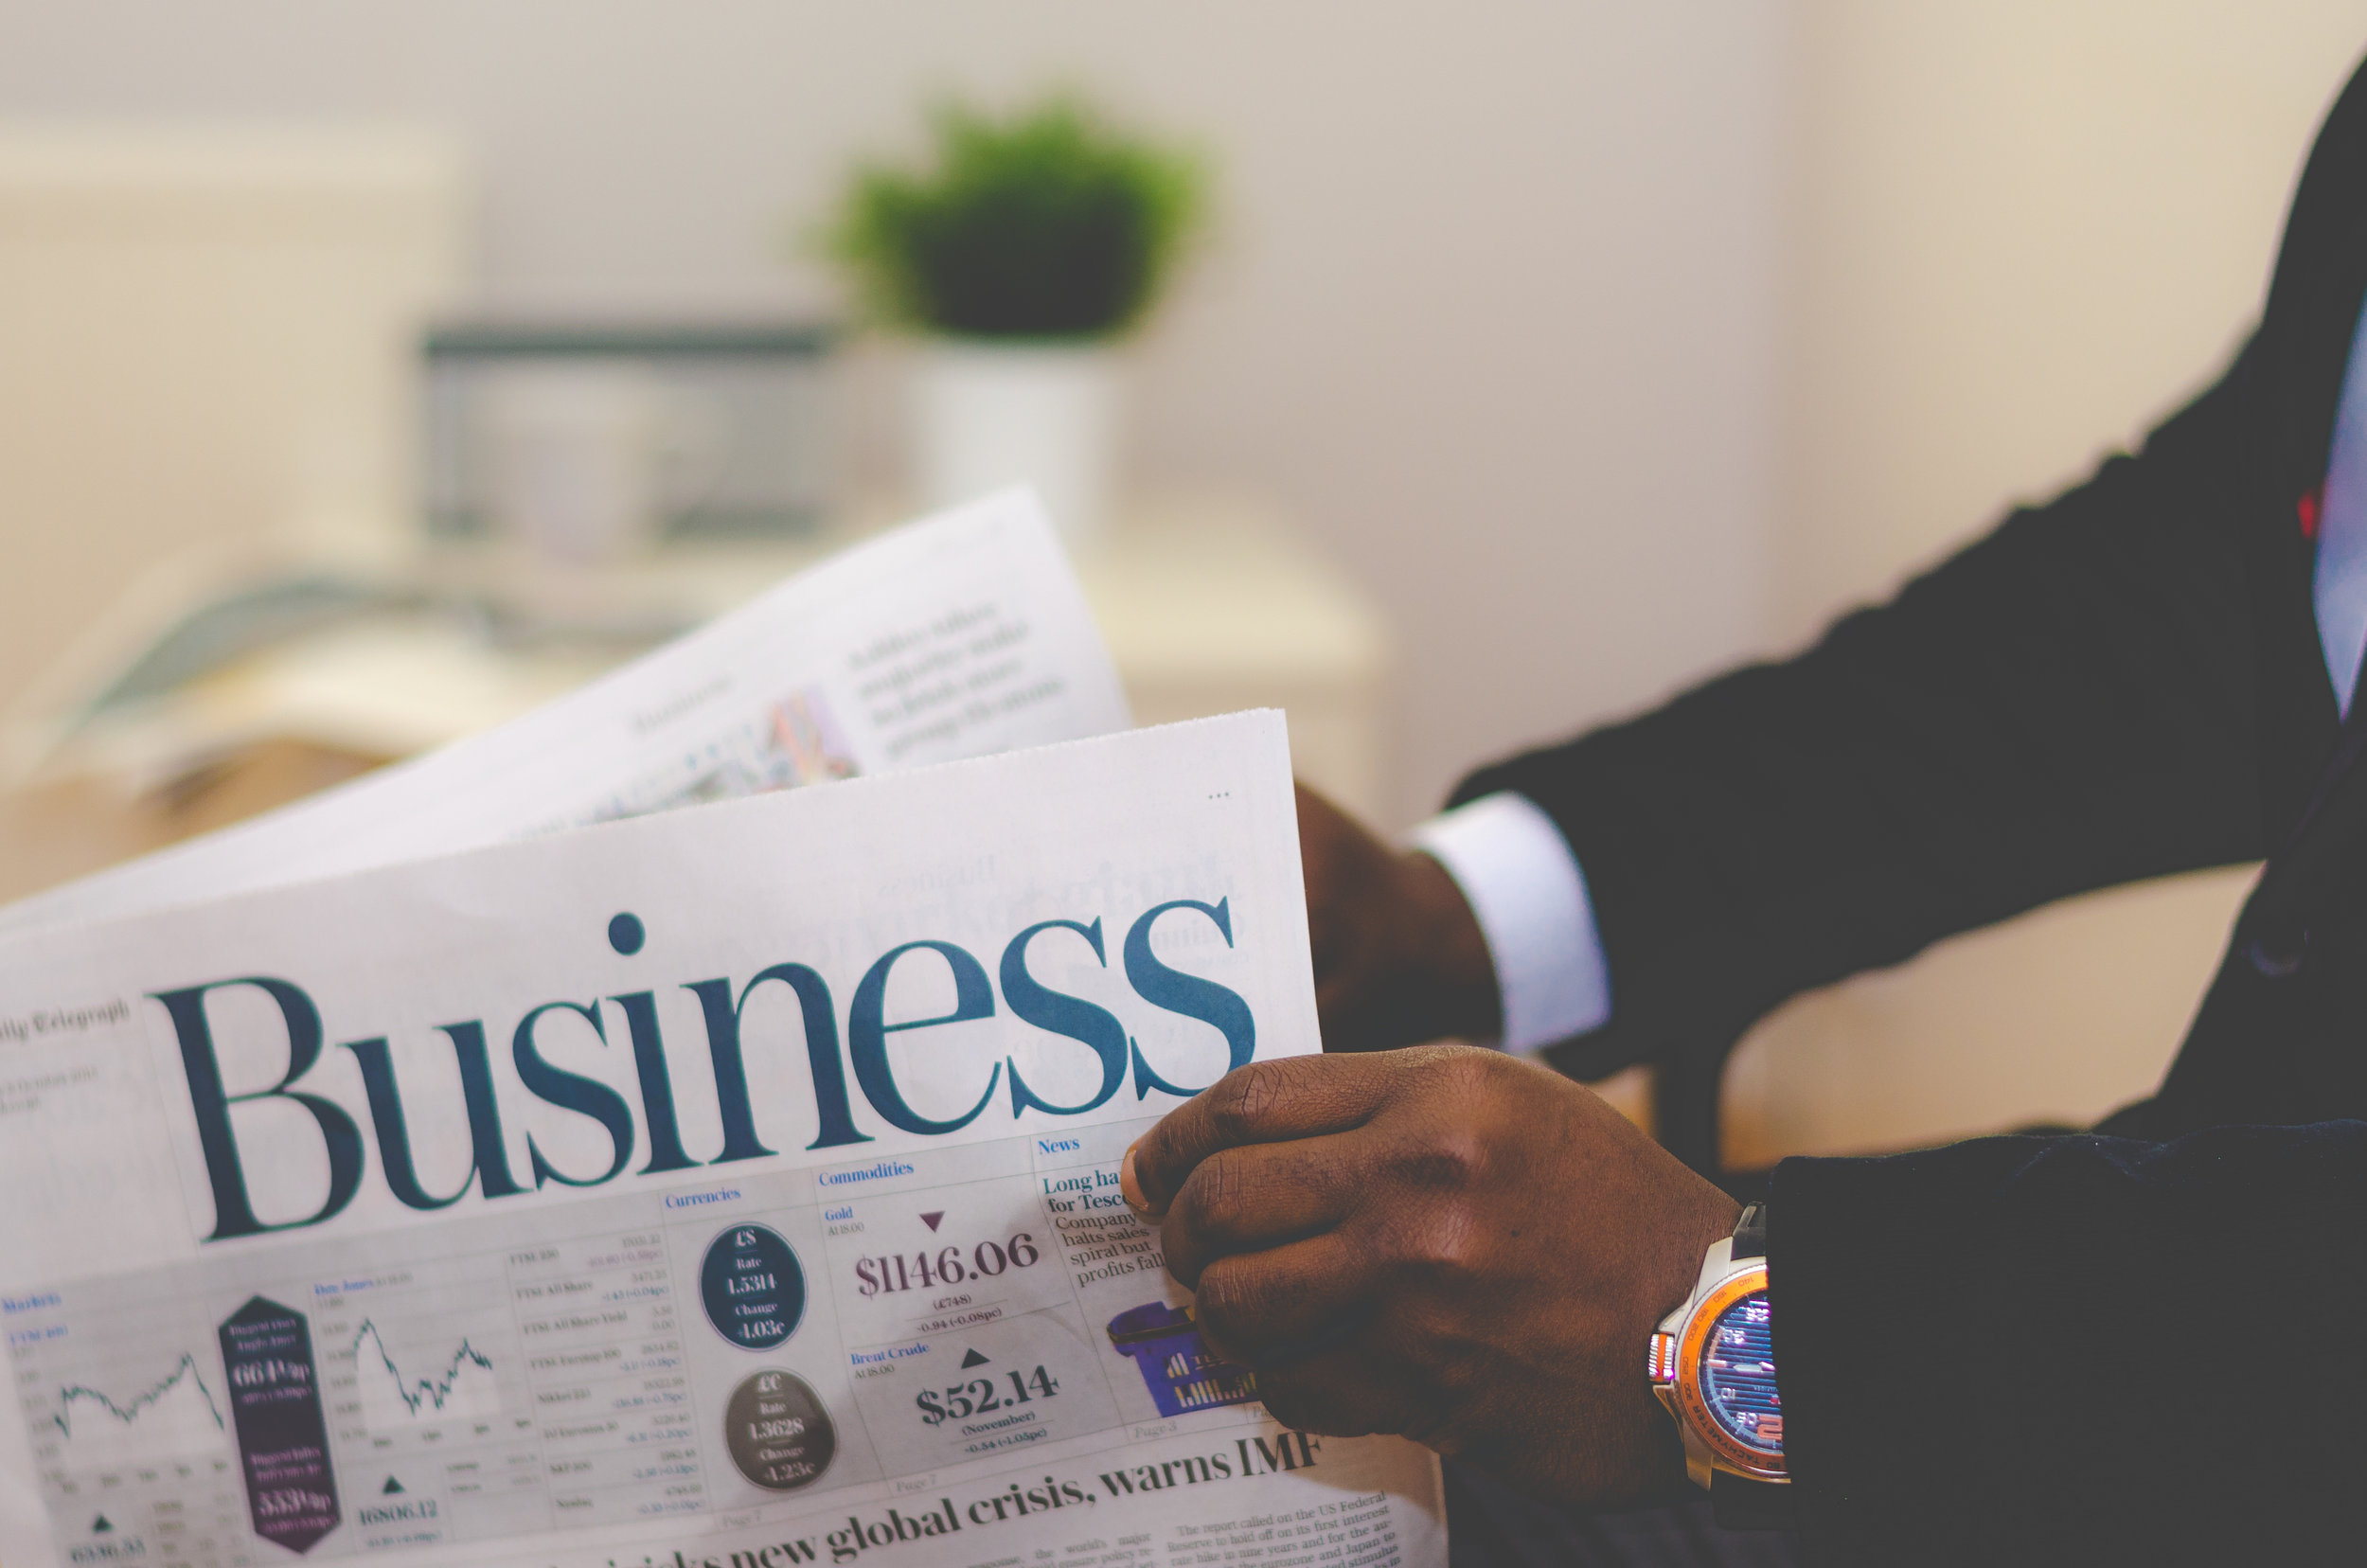 BUSINESS, FINANCE & NEWS - 9MM UVs